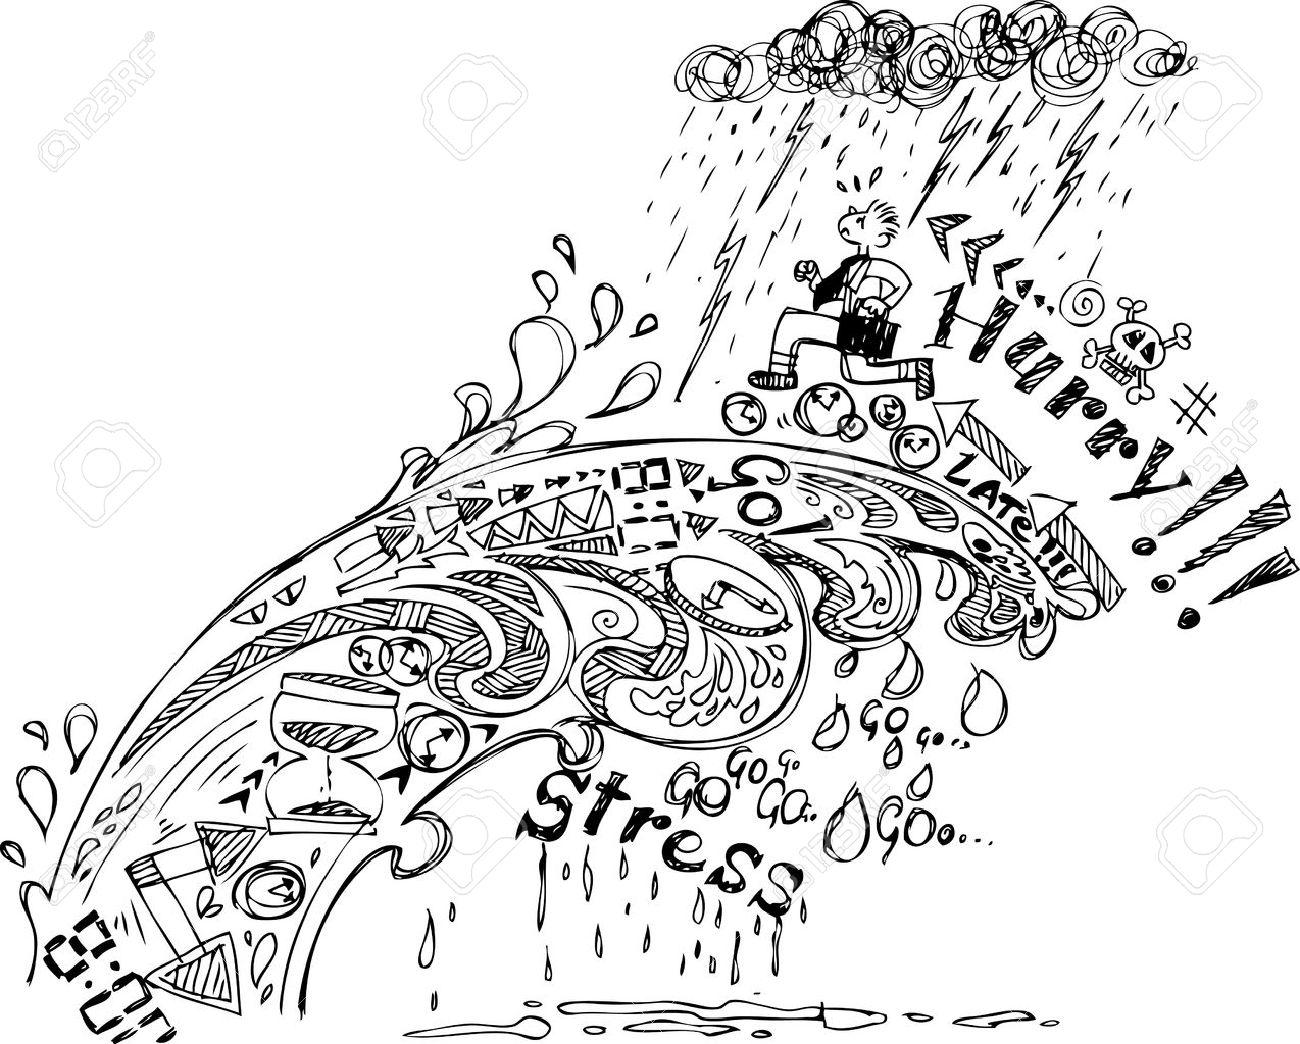 Sketch doodles Hurry - 20936421